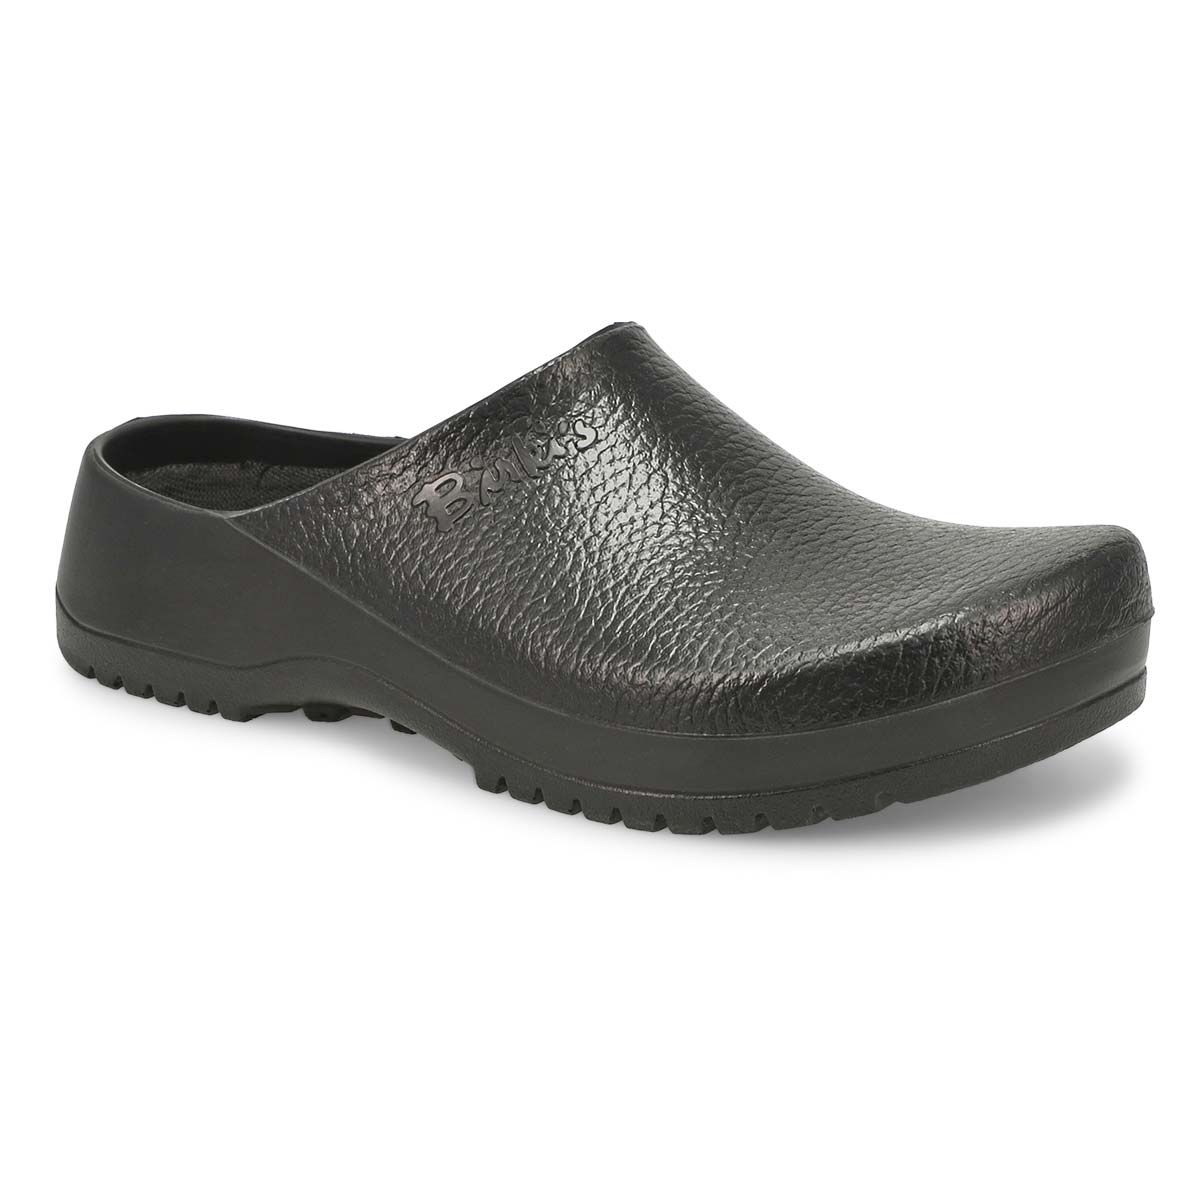 Men's Super-Birki Clog - Black